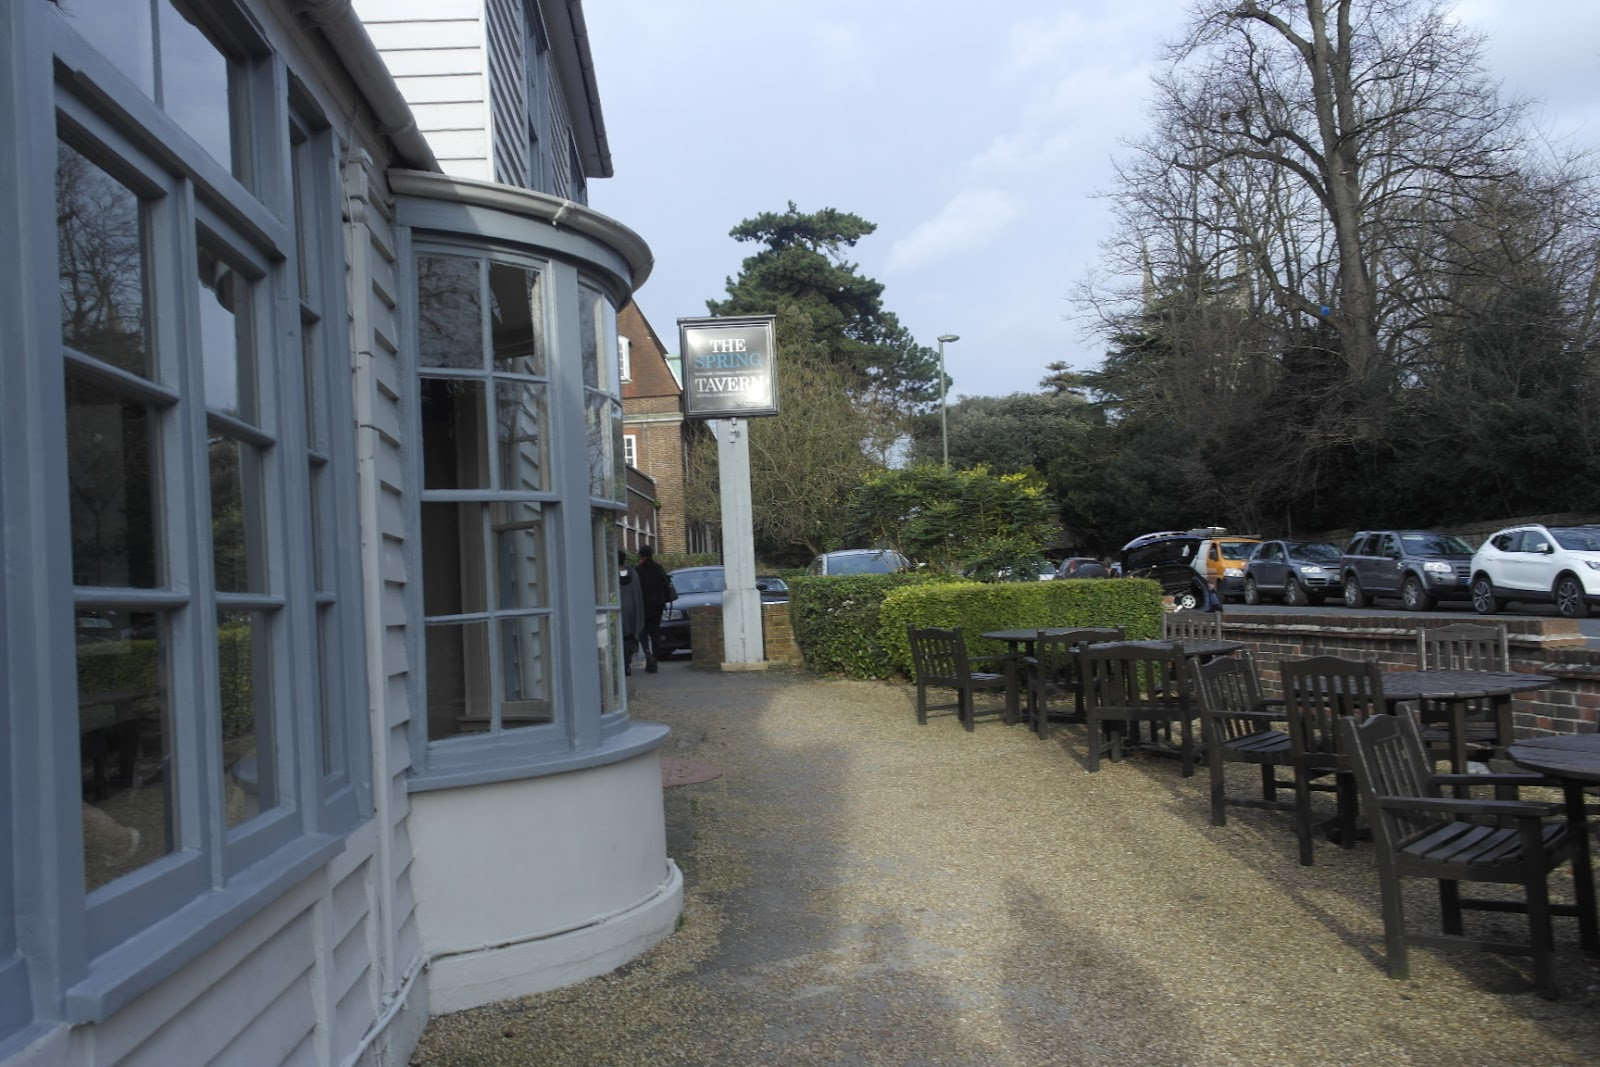 Spring Tavern, Ewell